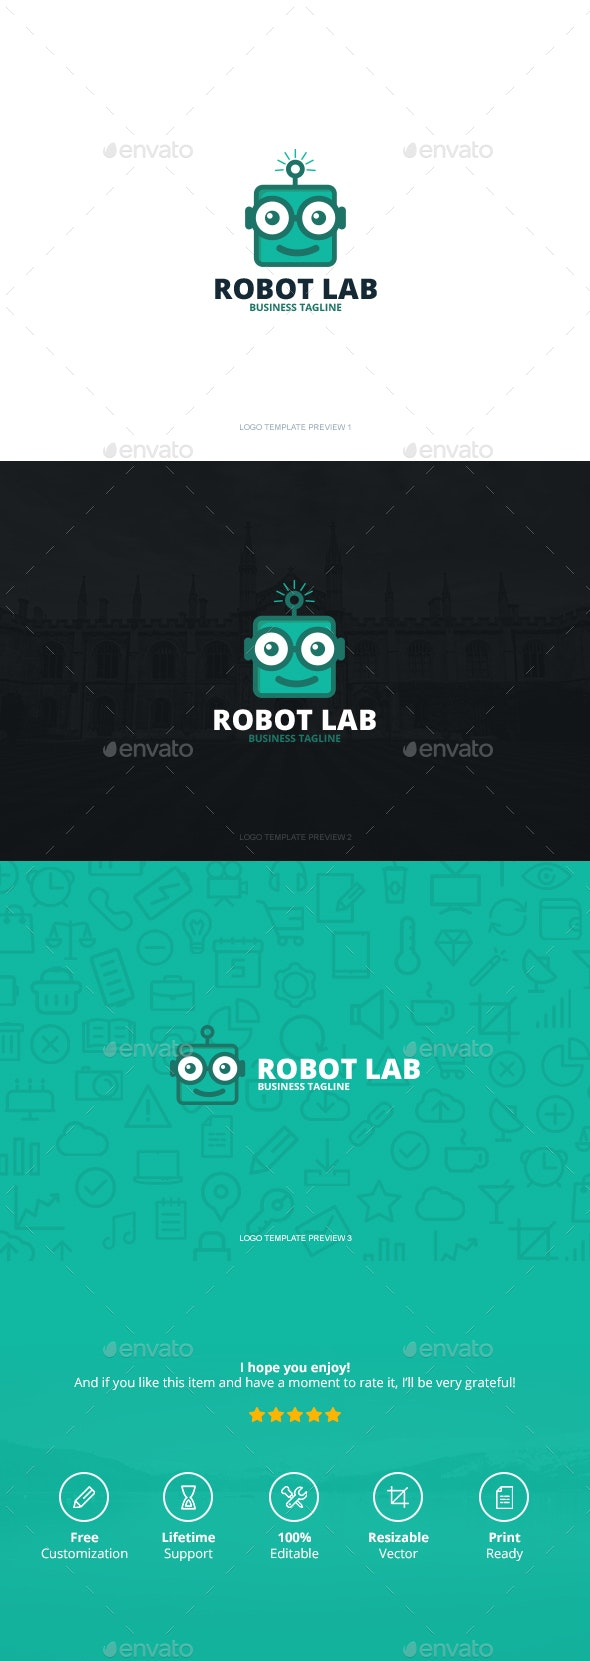 Robot Lab Logo by CreativeSquare | GraphicRiver